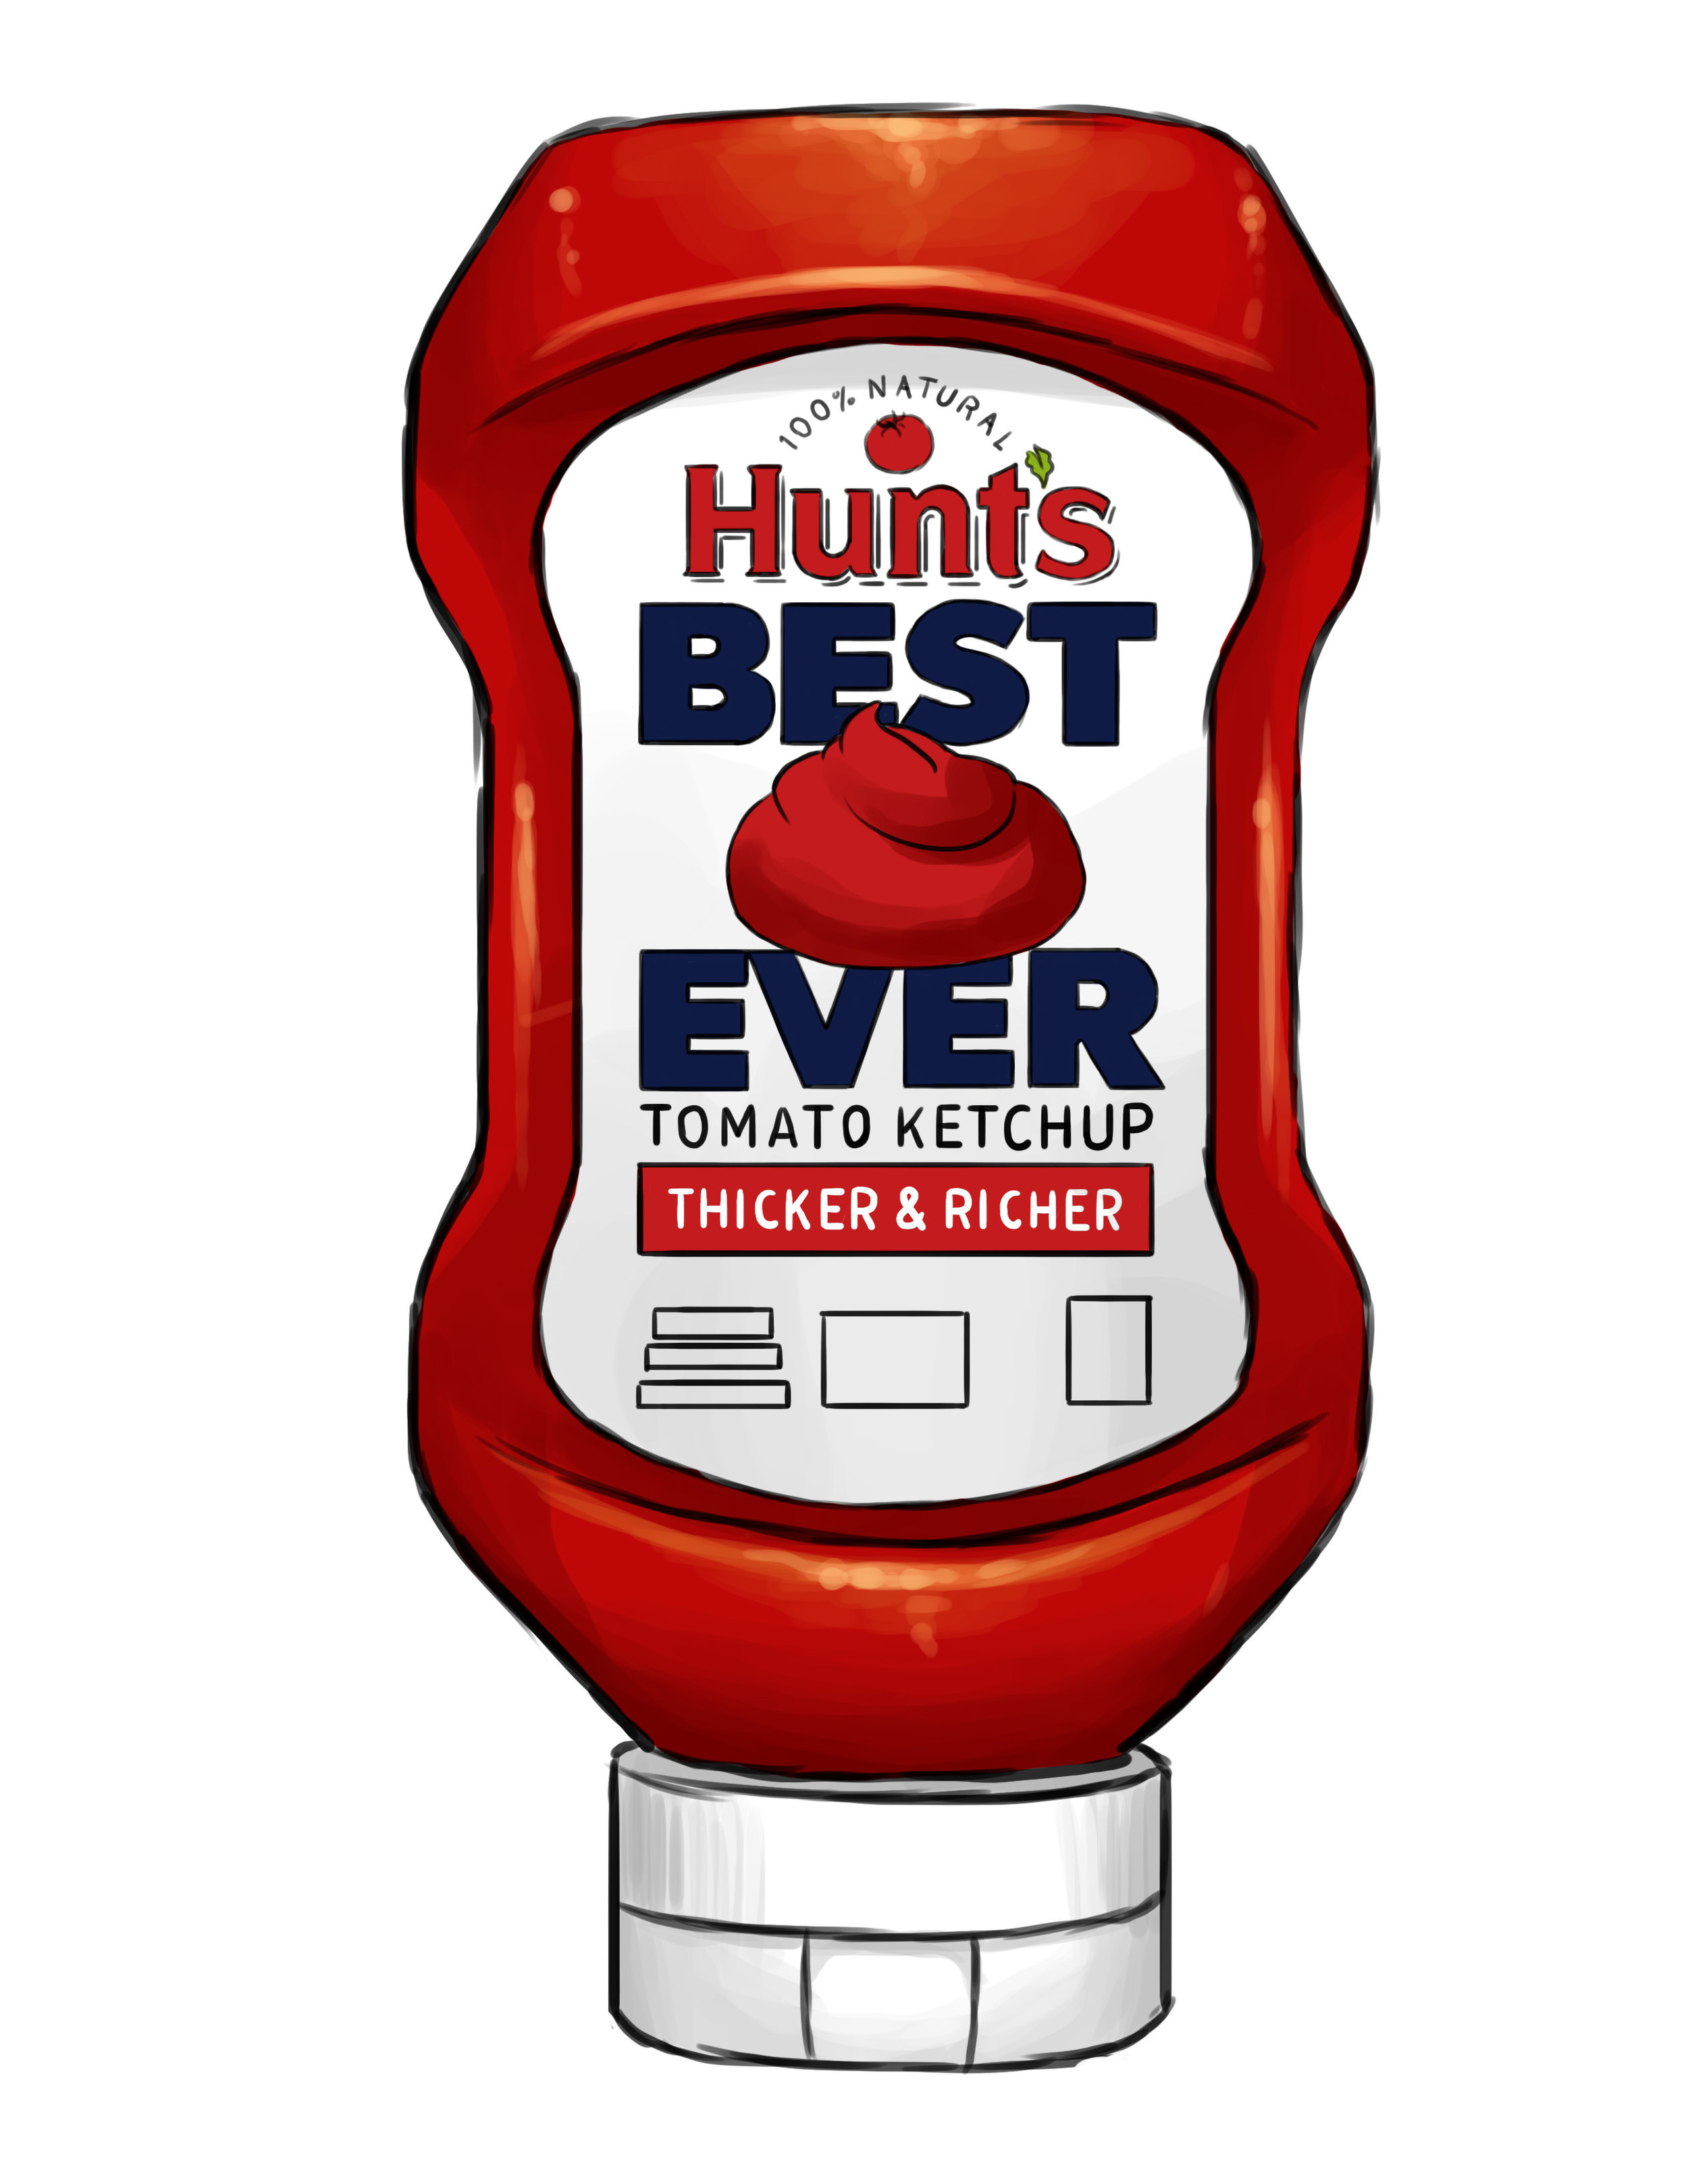 KetchupBottleIllustration.jpg